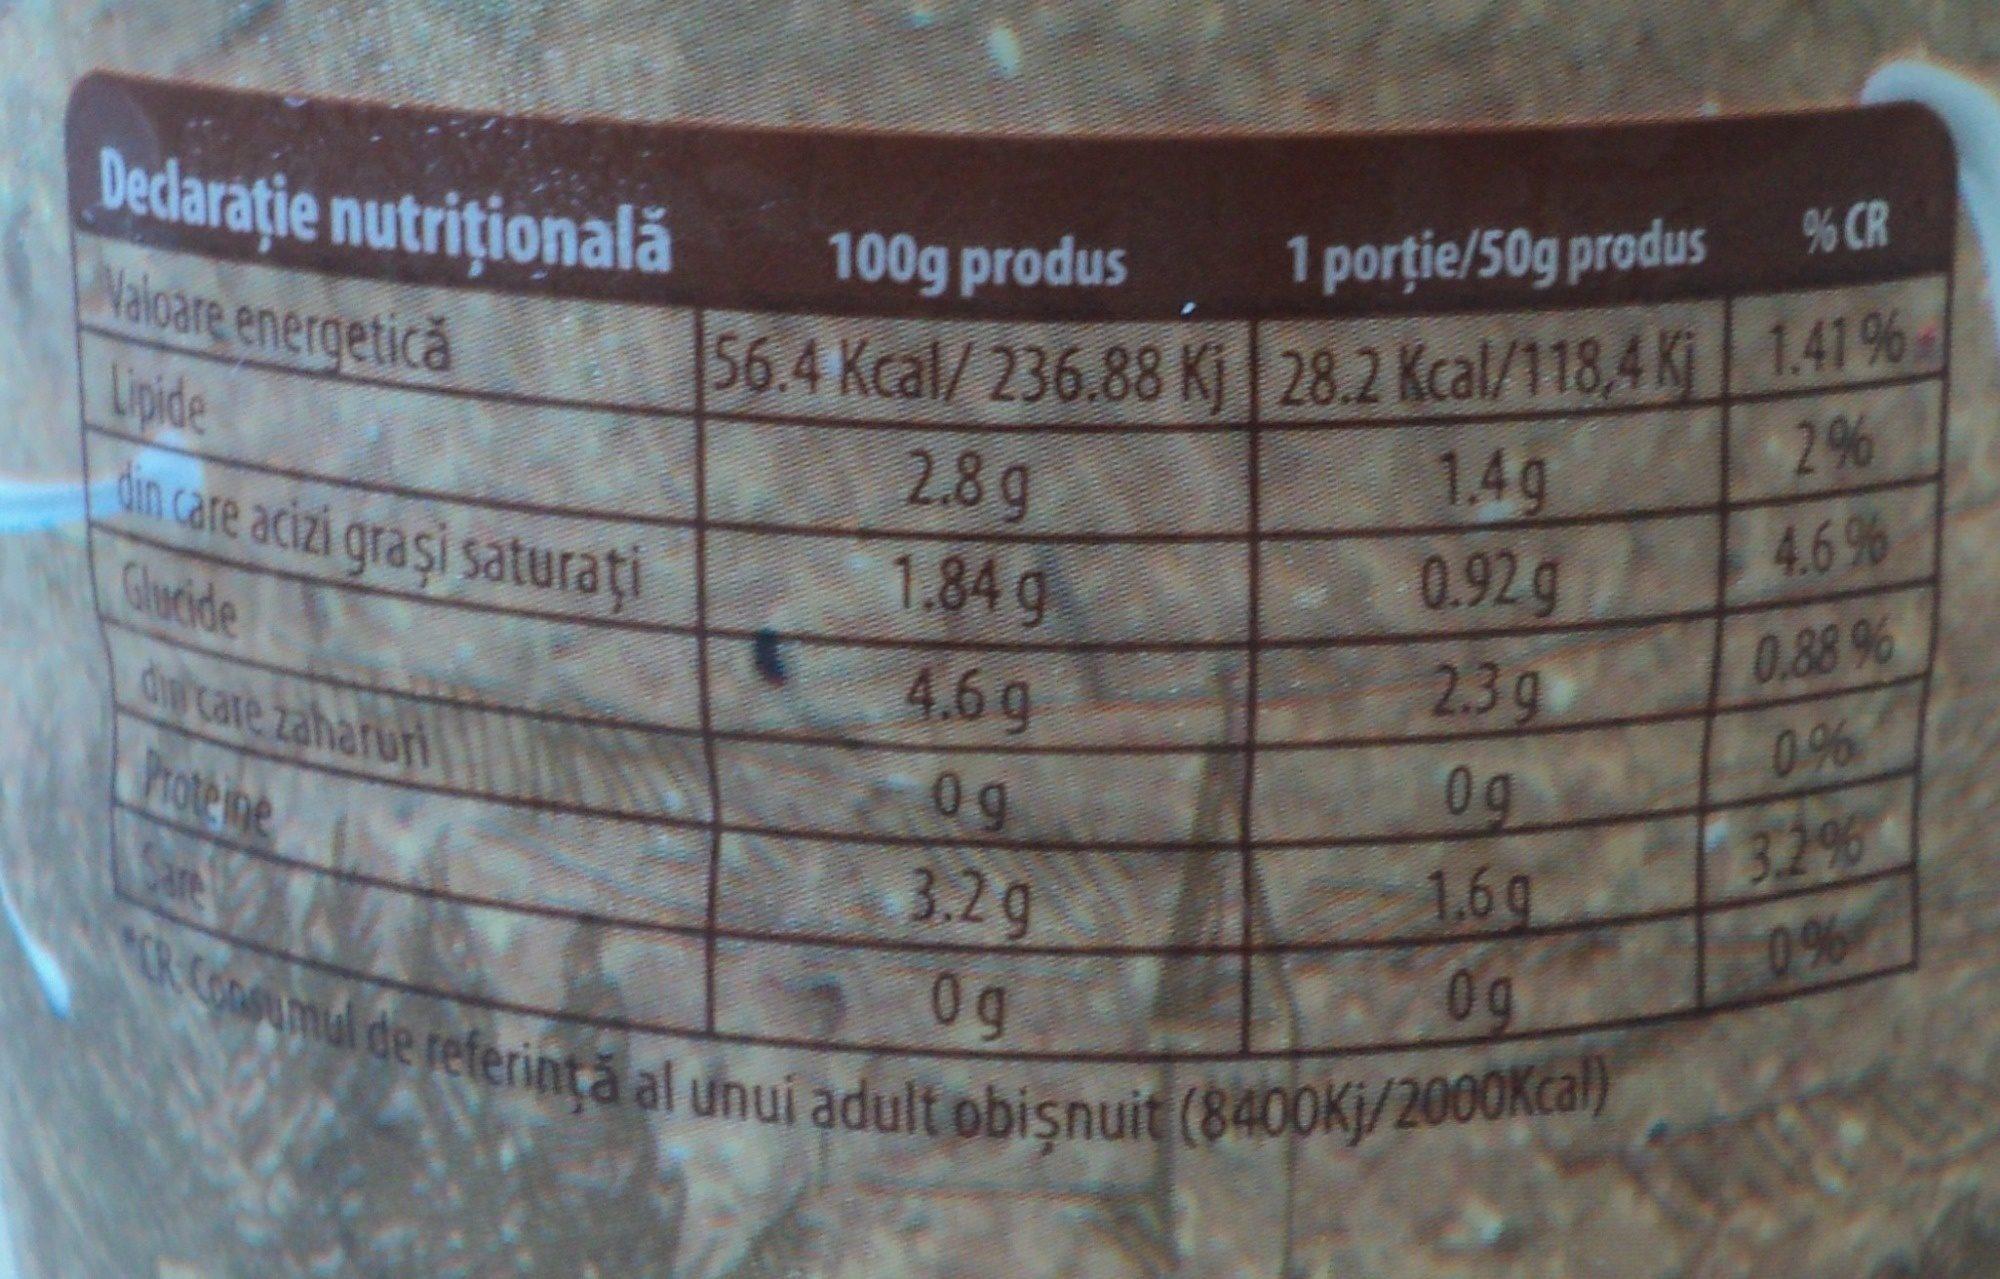 Solomonescu Iaurt 2,8% grasime cu fermenti bifidus - Nutrition facts - ro